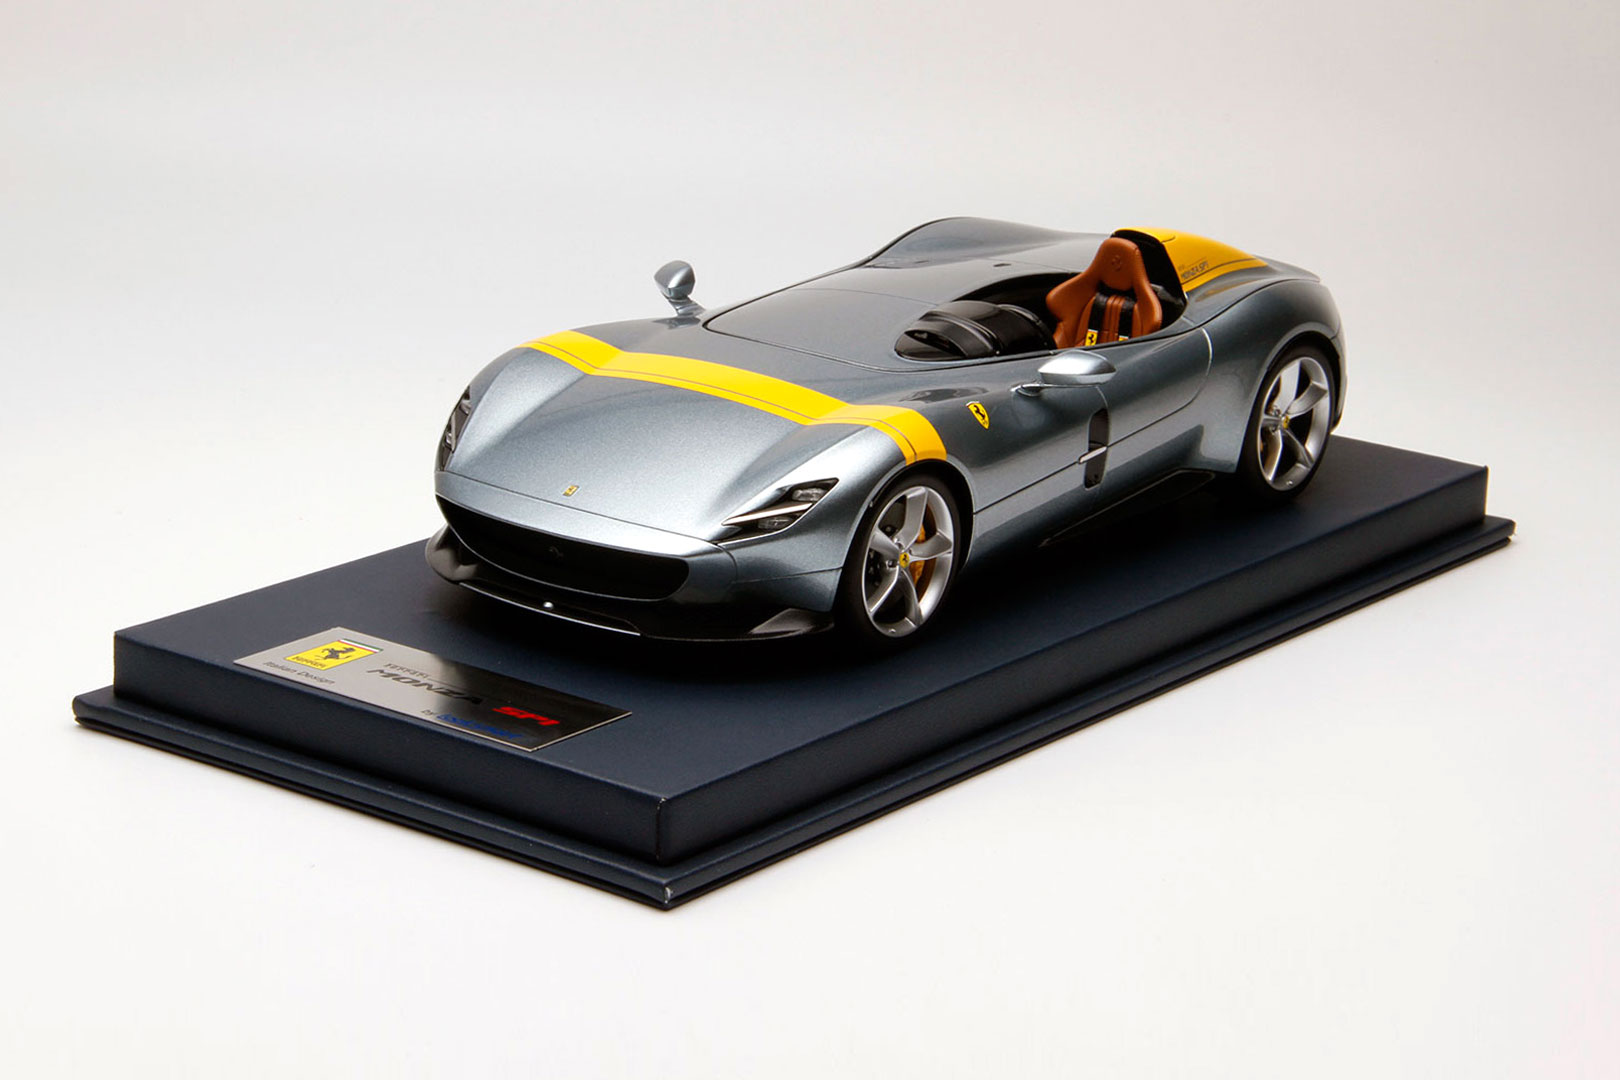 Ferrari Monza Sp1 1 18 Looksmart Models